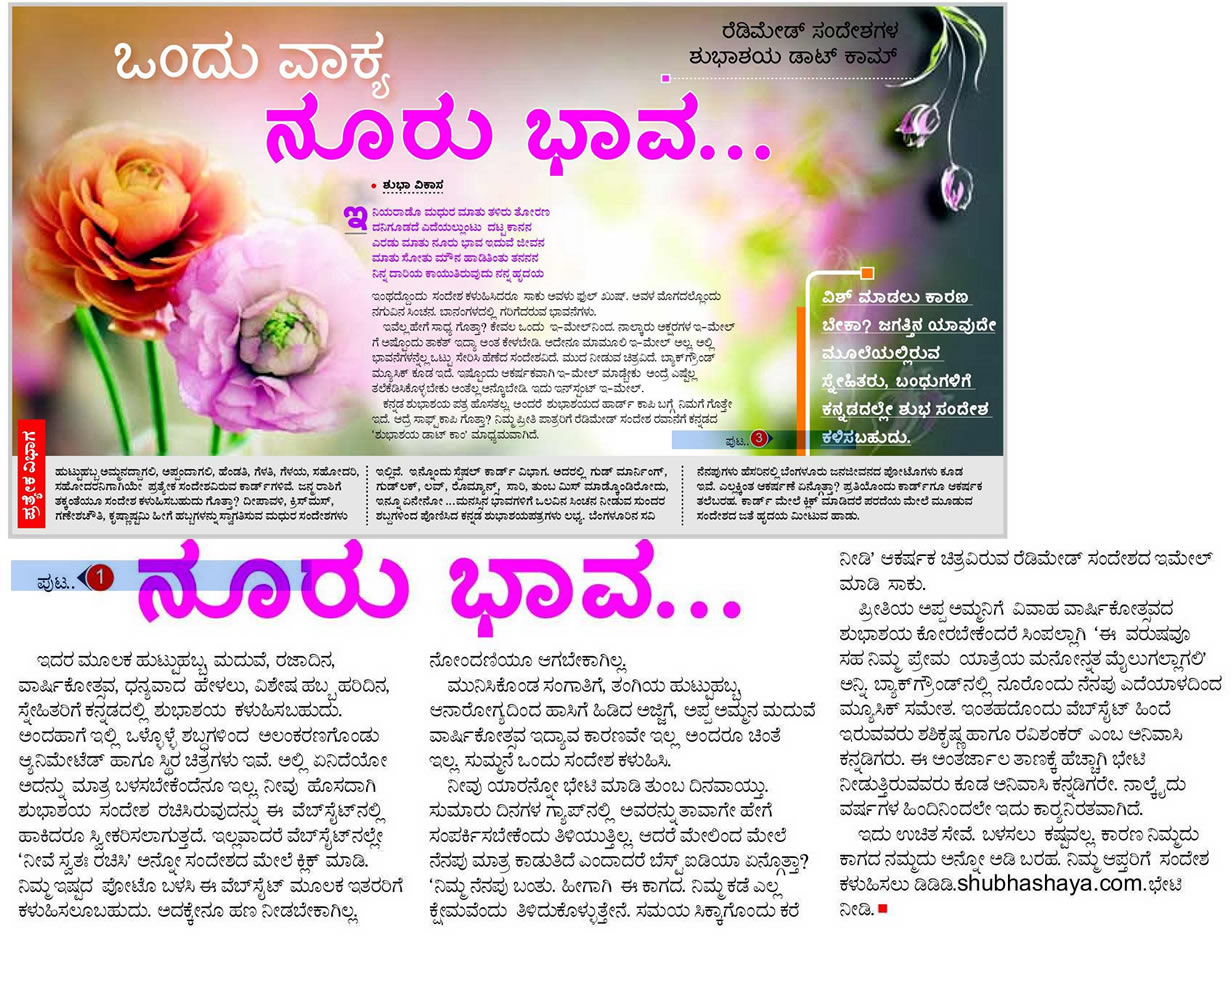 Shubhashaya Kannada Greetings About Us